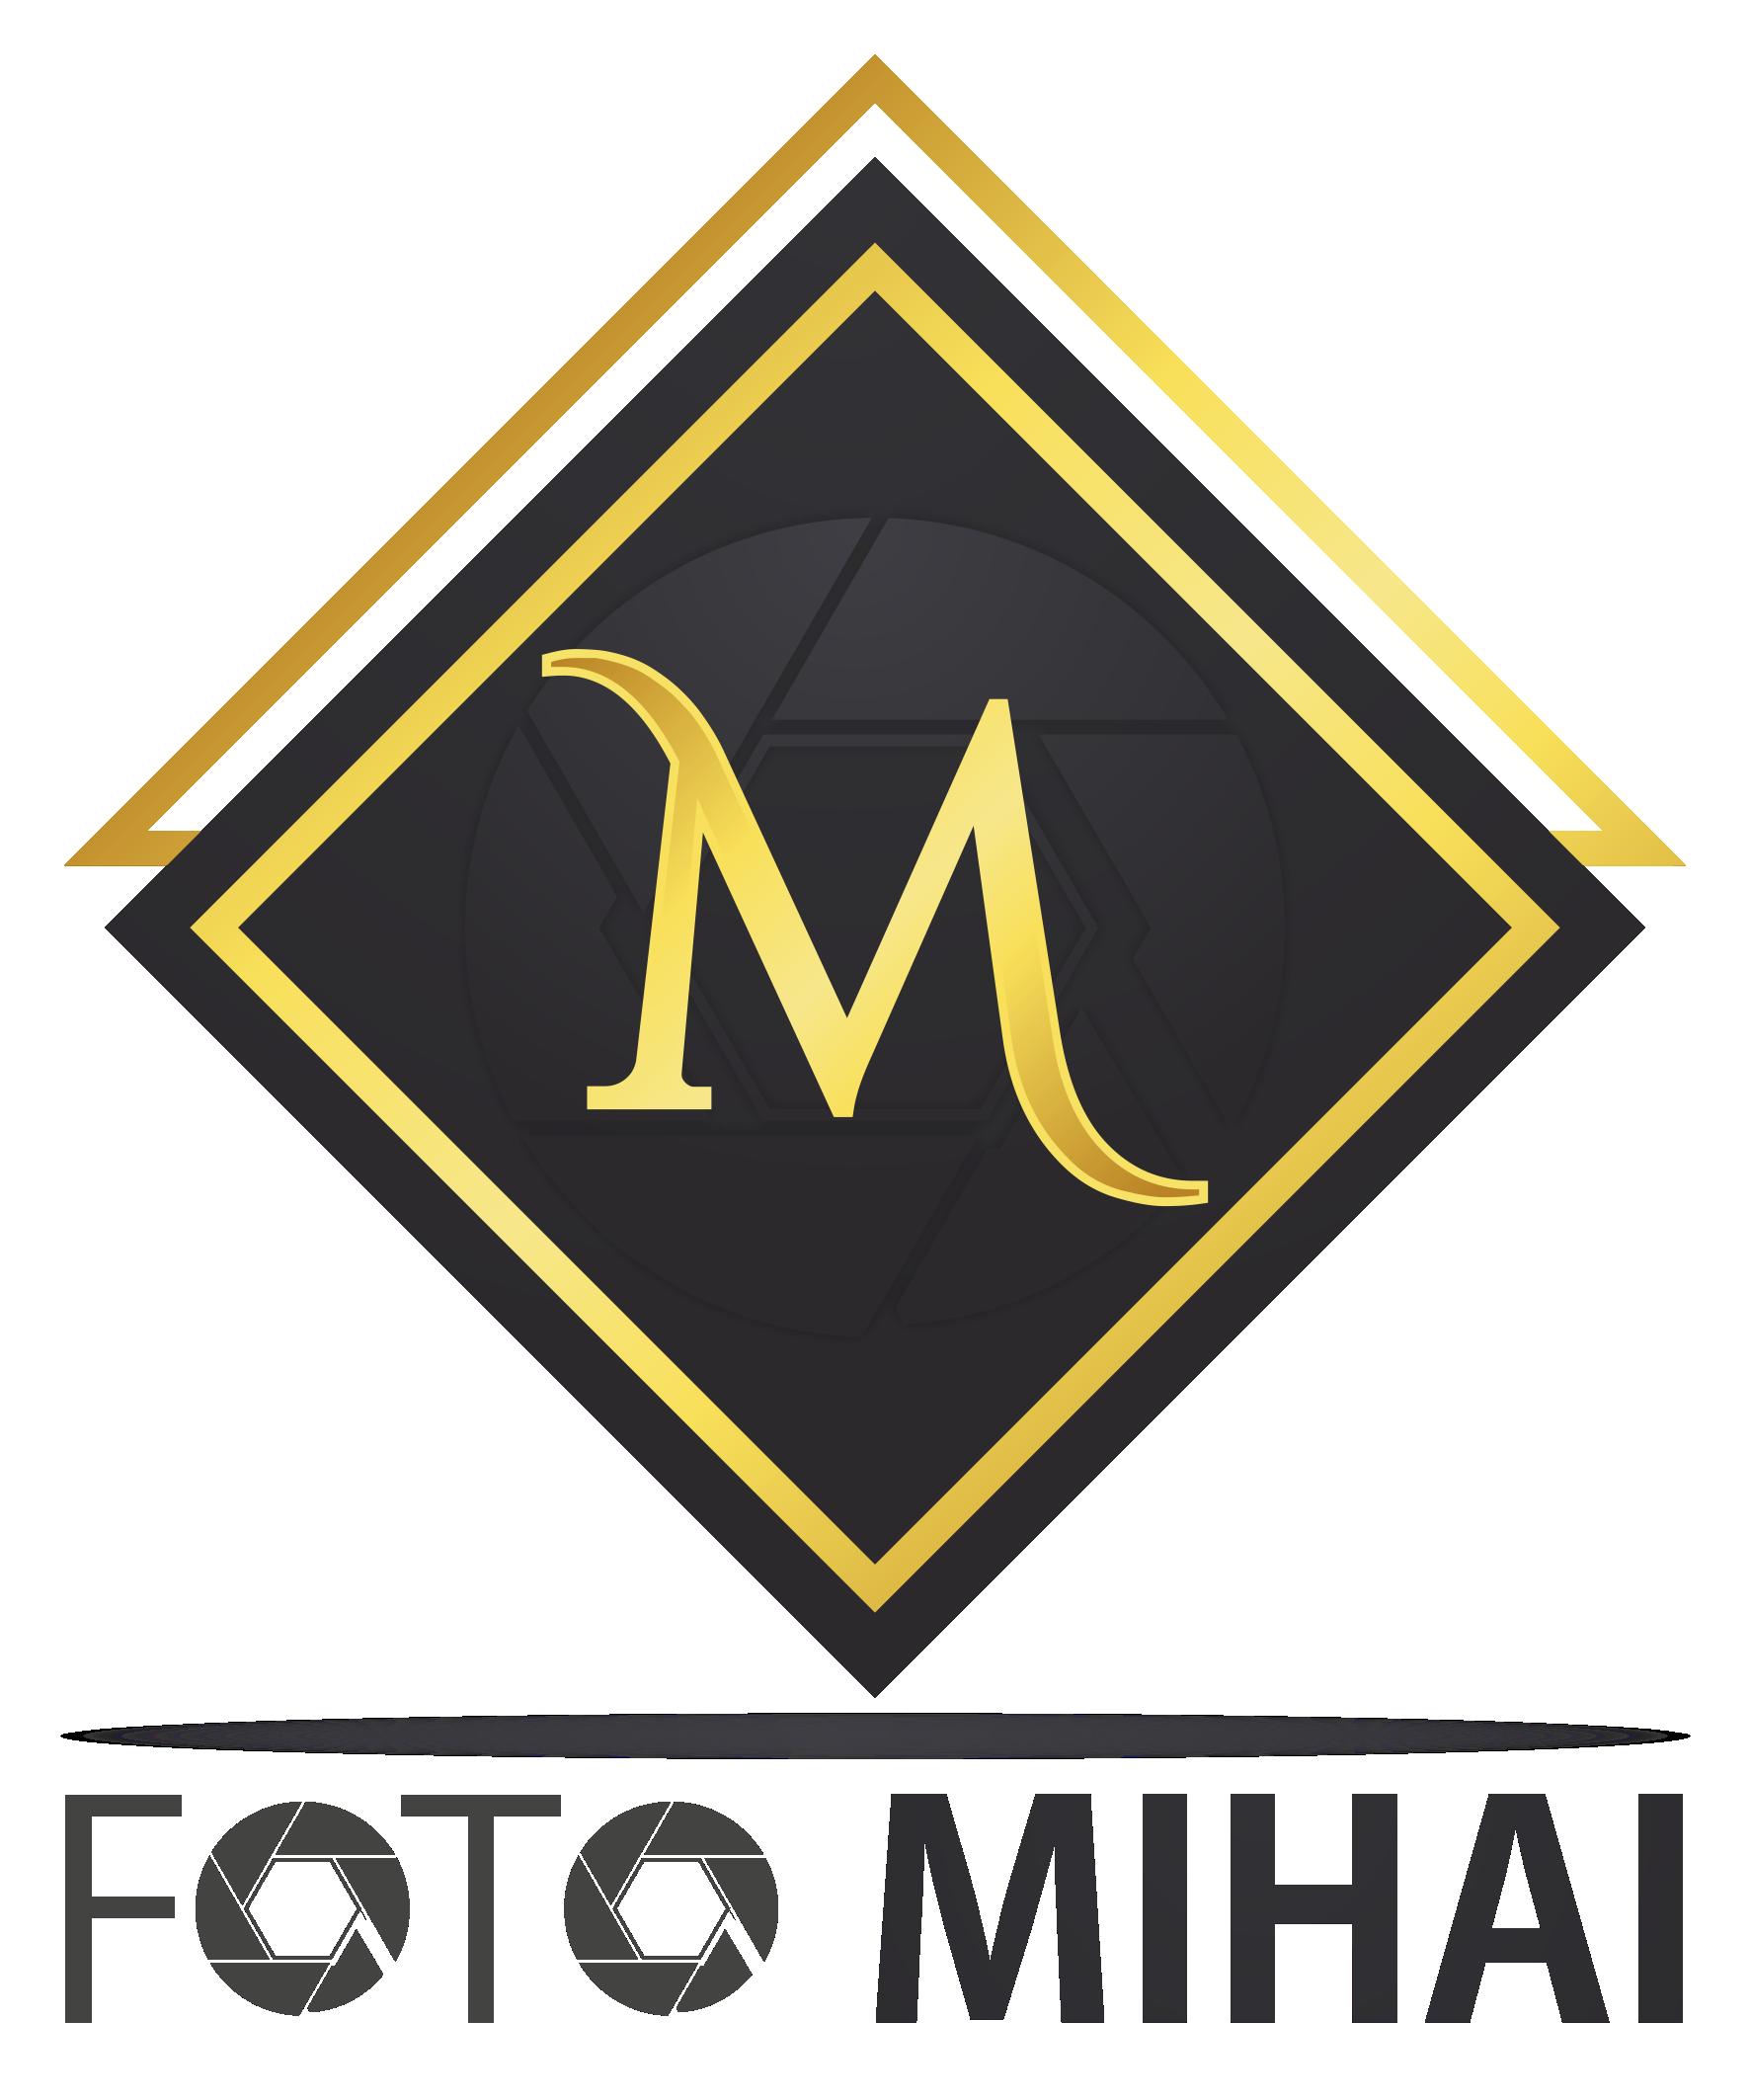 Foto Mihai